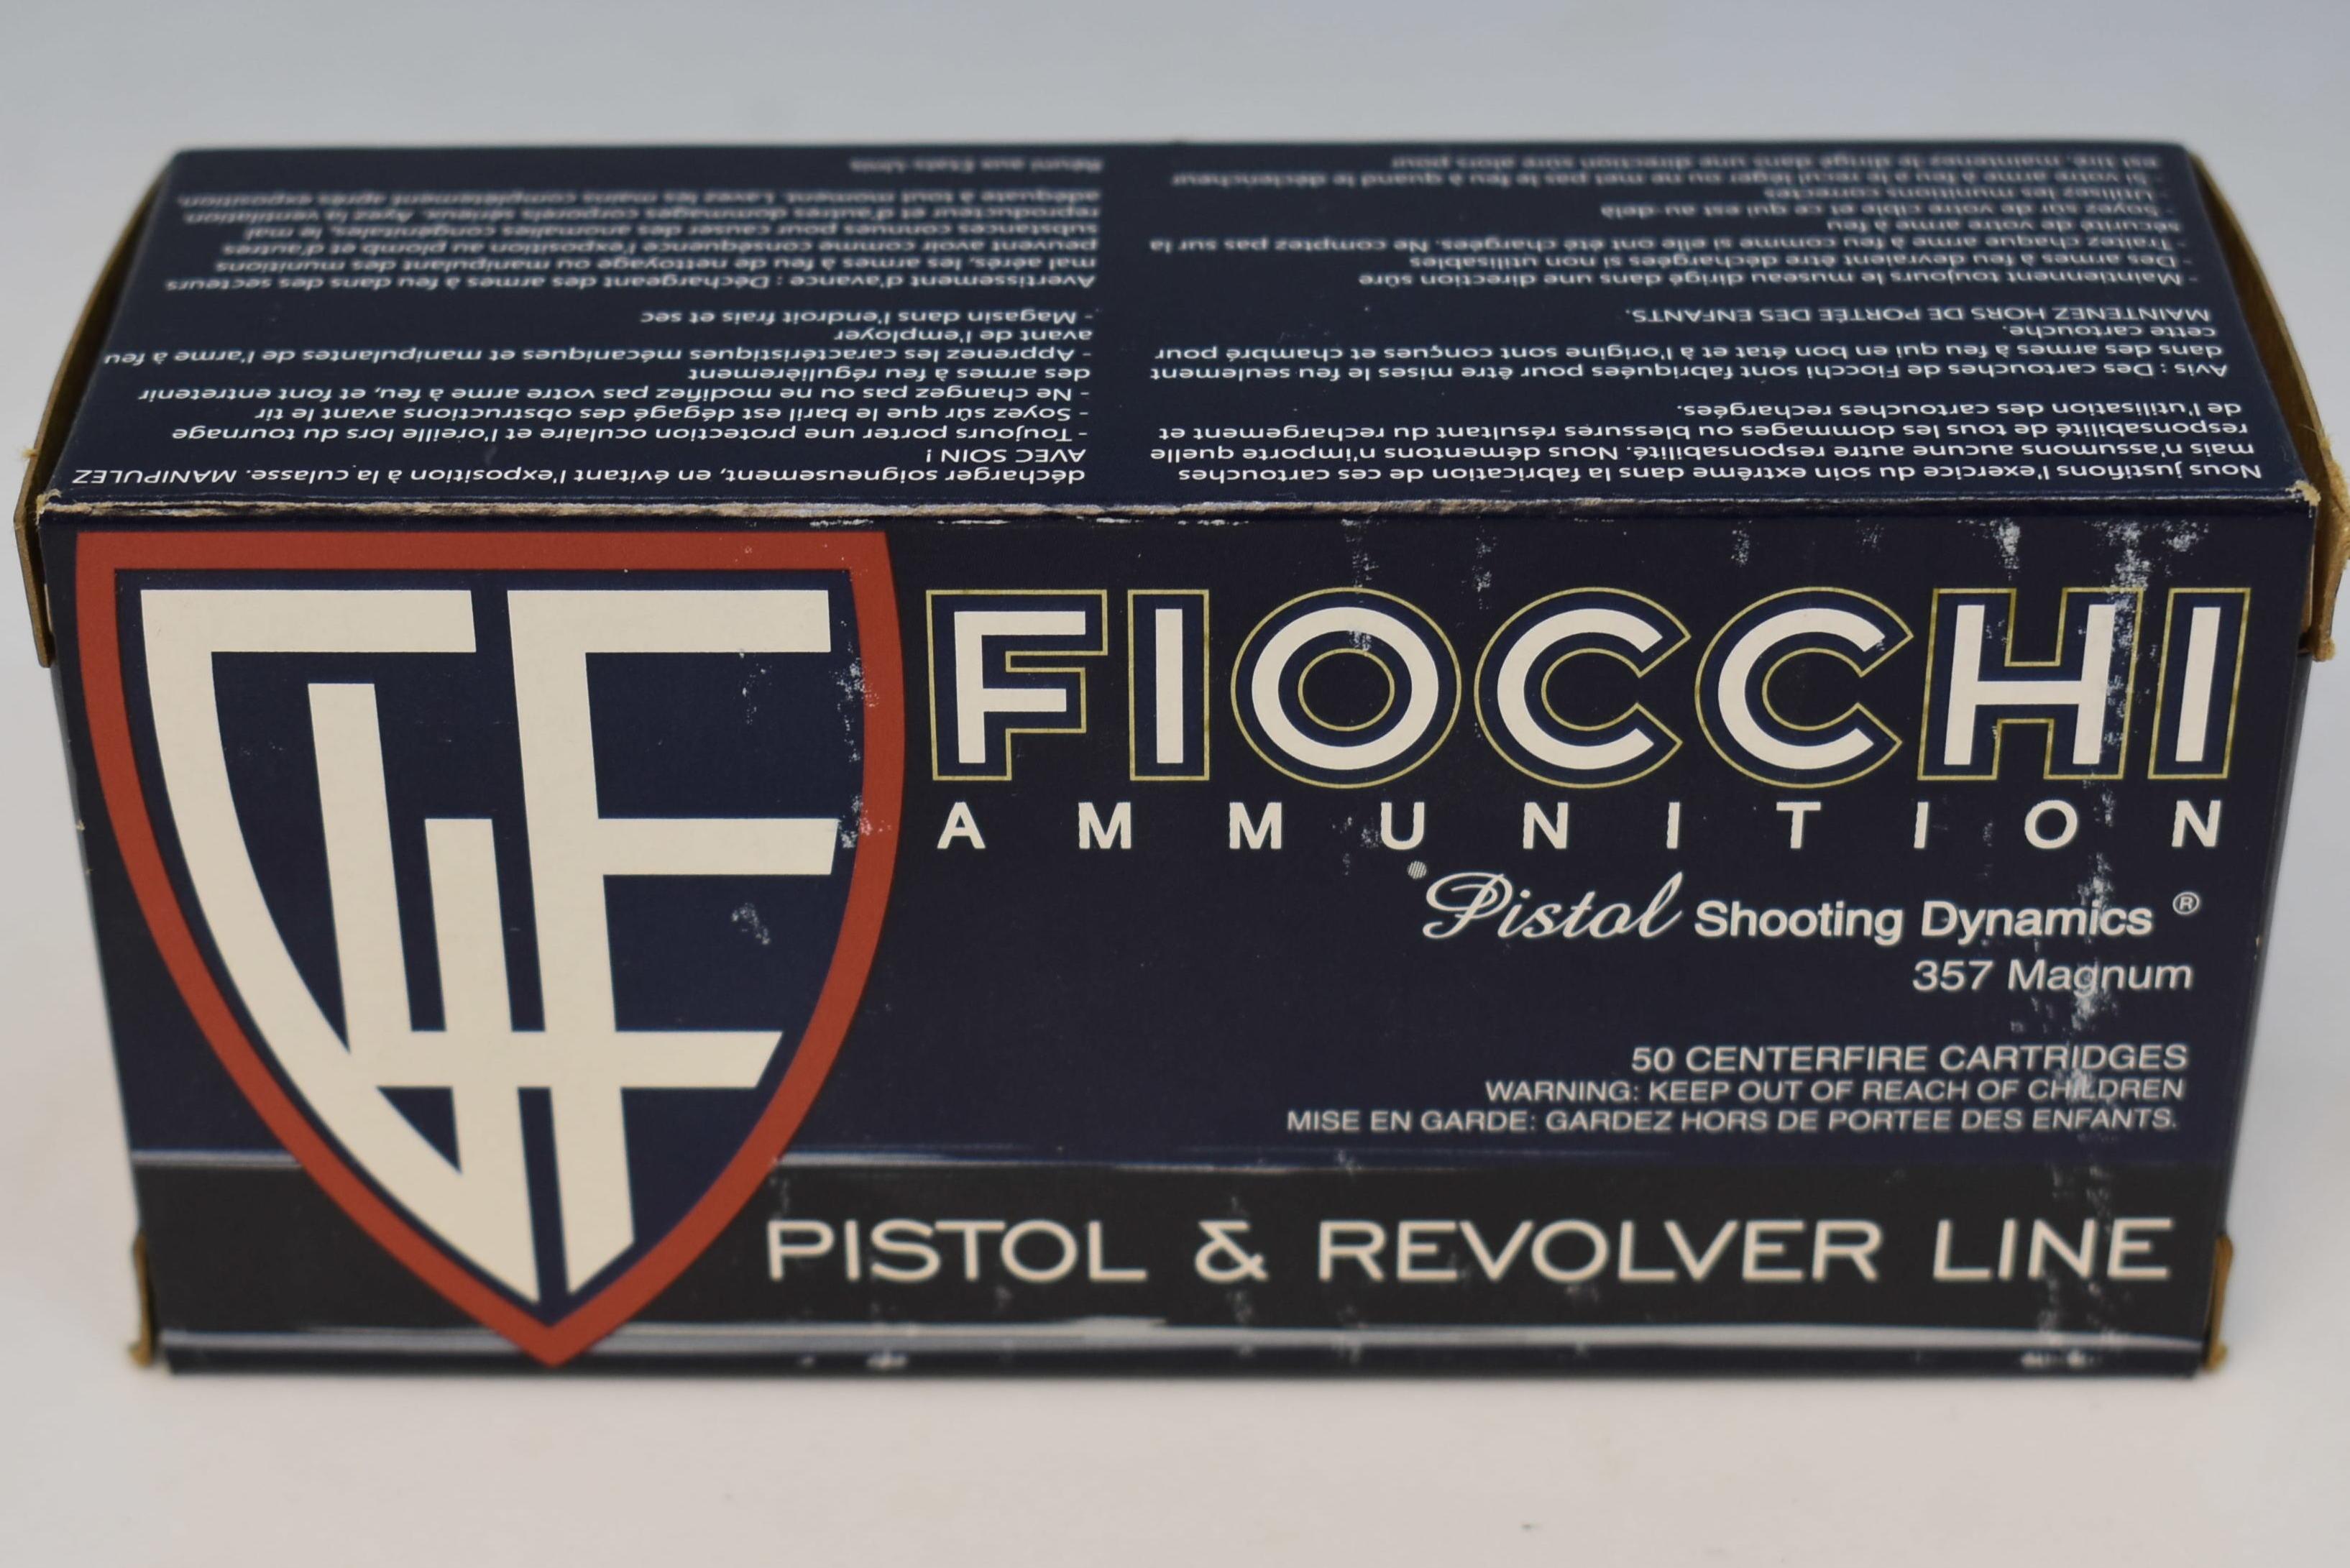 FIOCCHI -  - AMMUNITION SPORTING EQUIPMENT